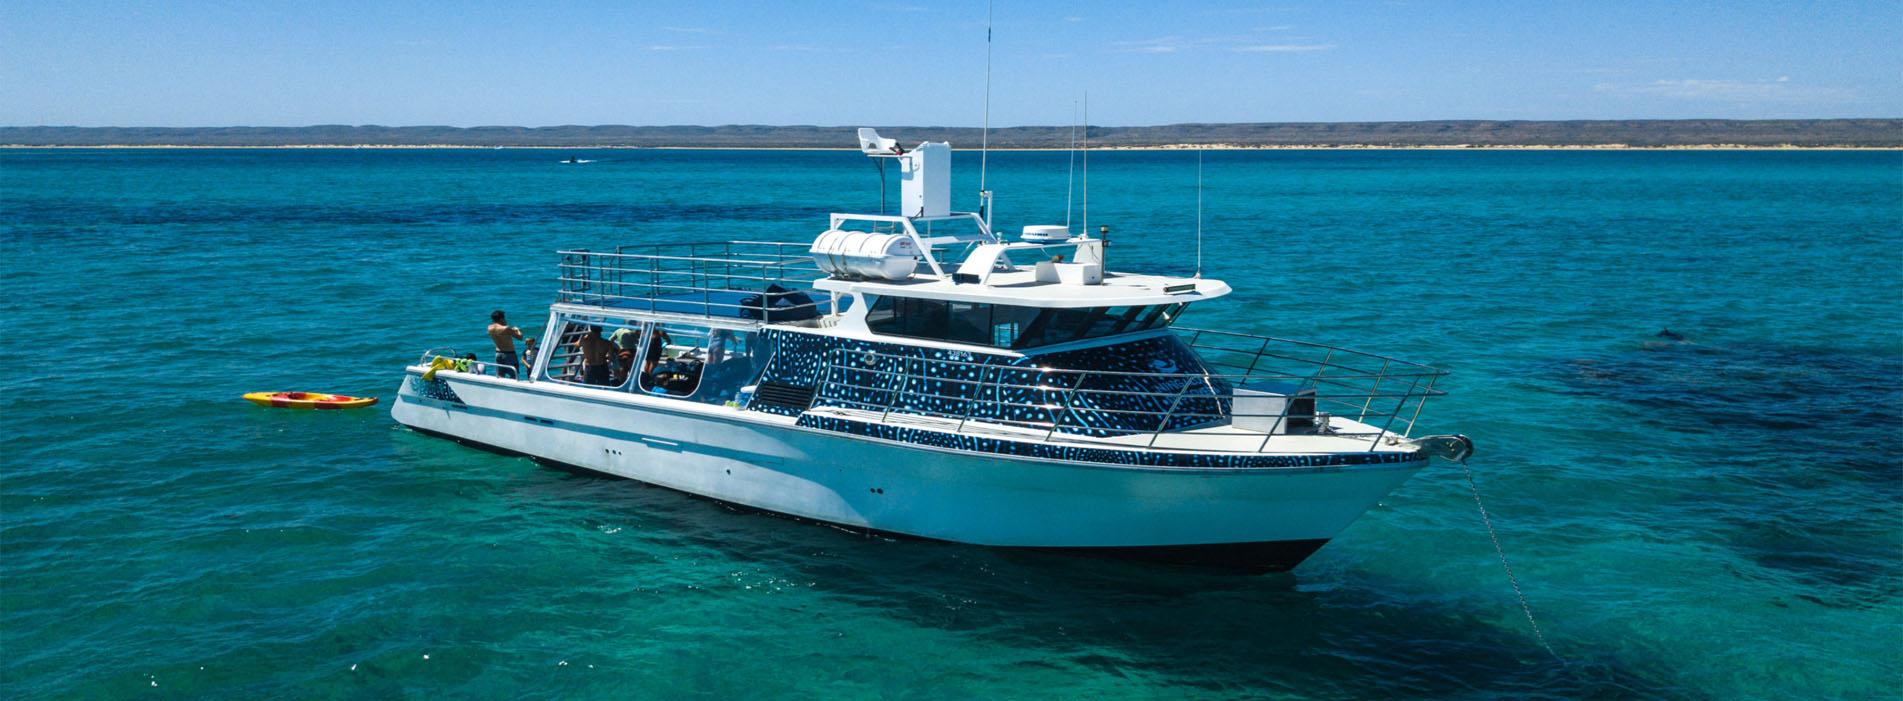 INVESTIGATOR whaleshark swimmers Ningaloo Reef Exmouth